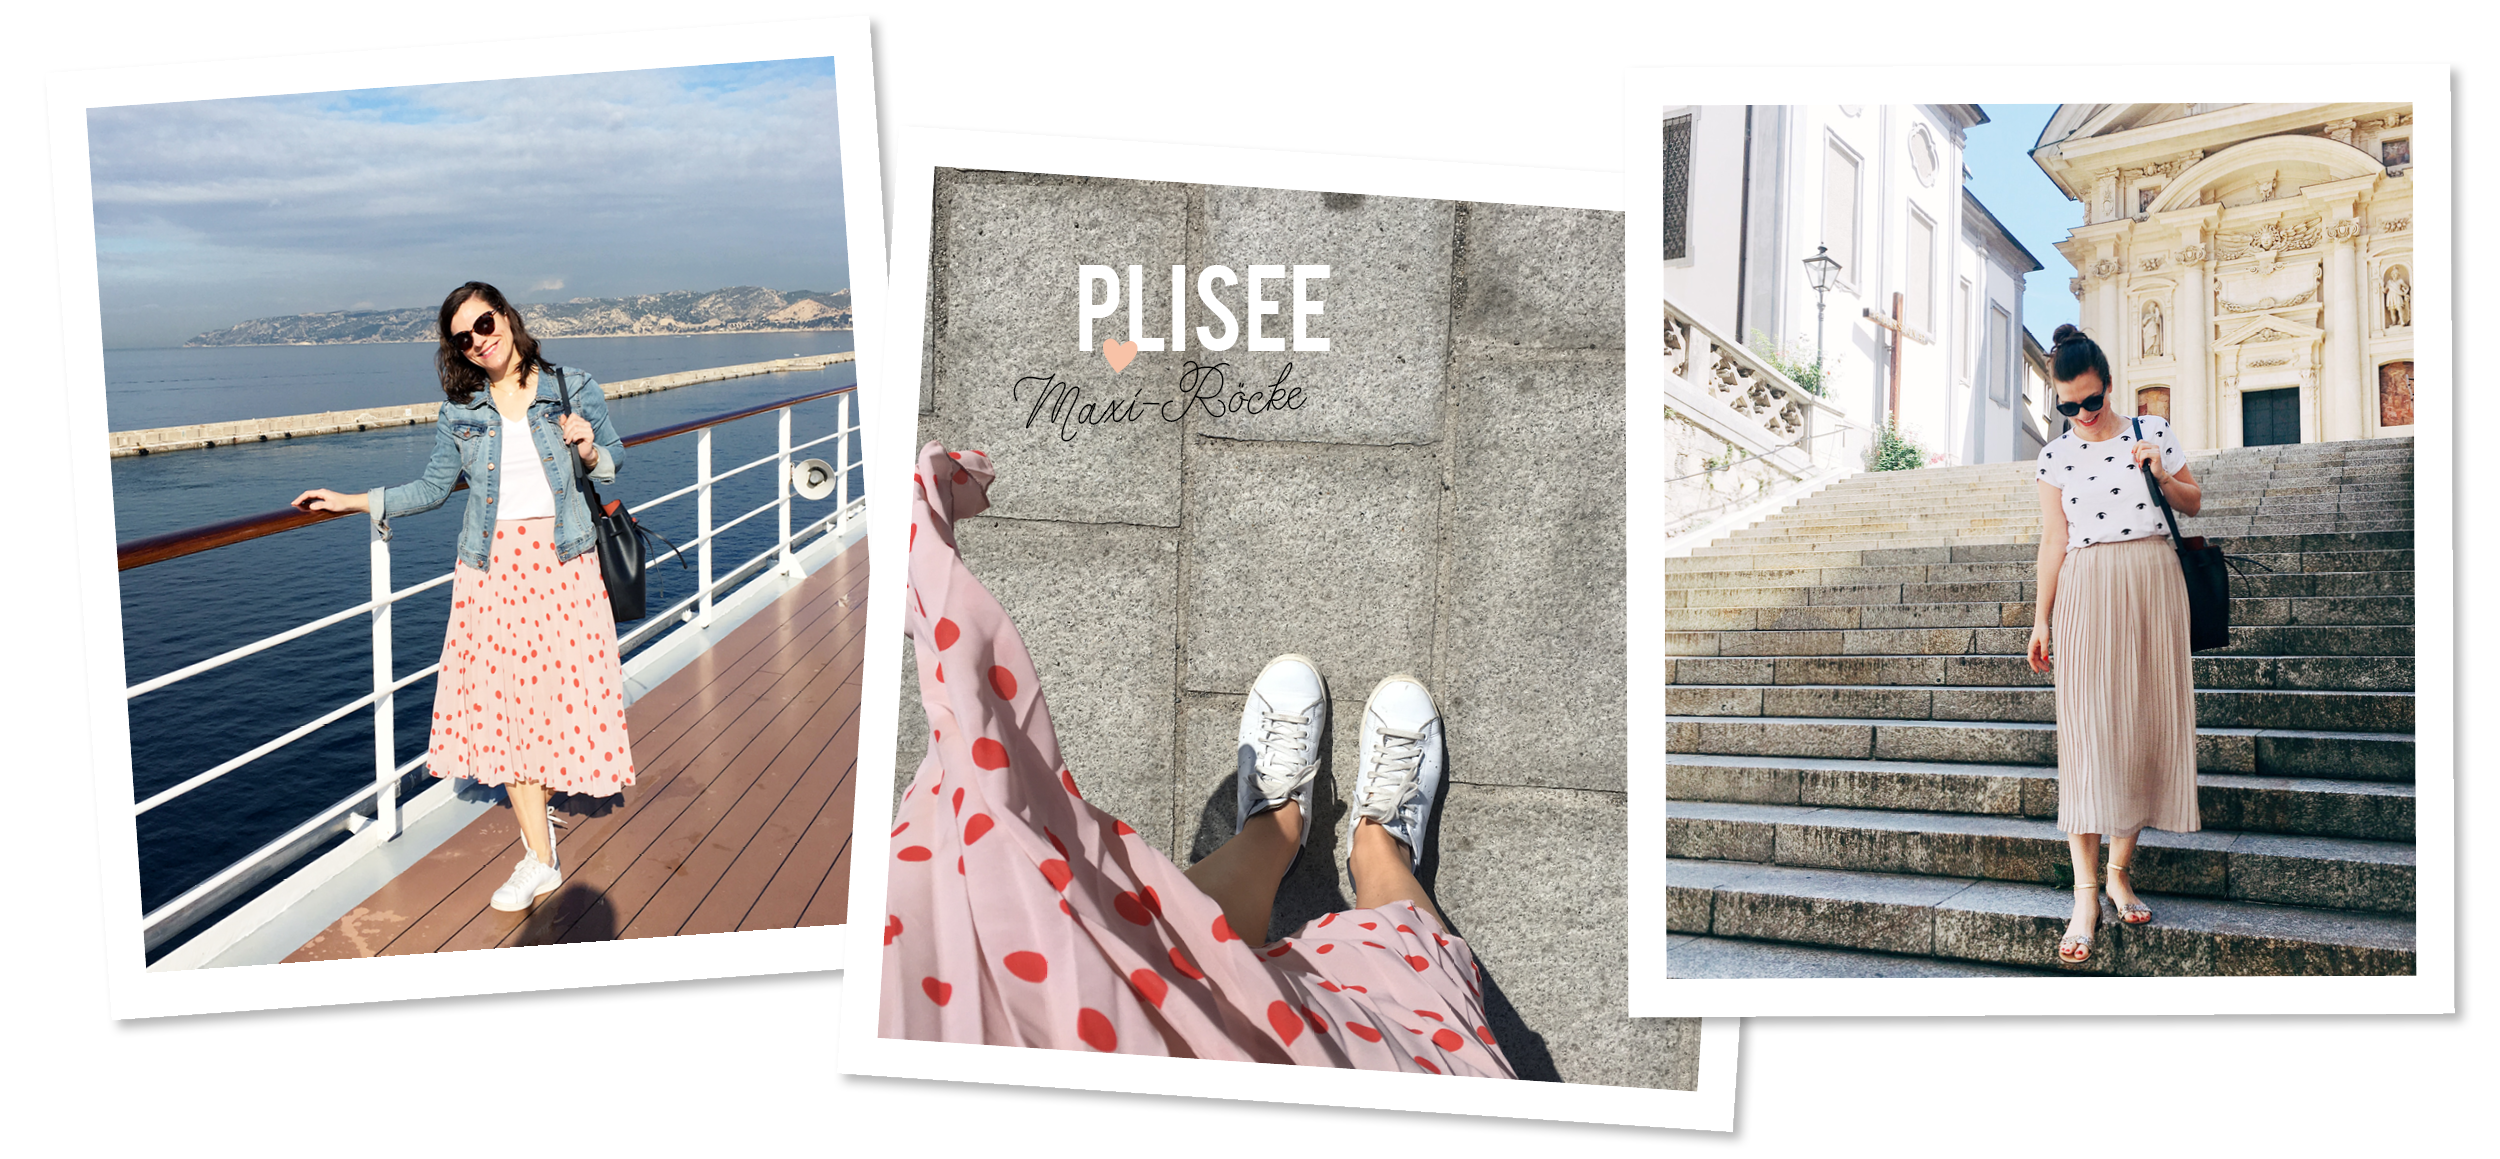 Plisee Skirts / Foxycheeks